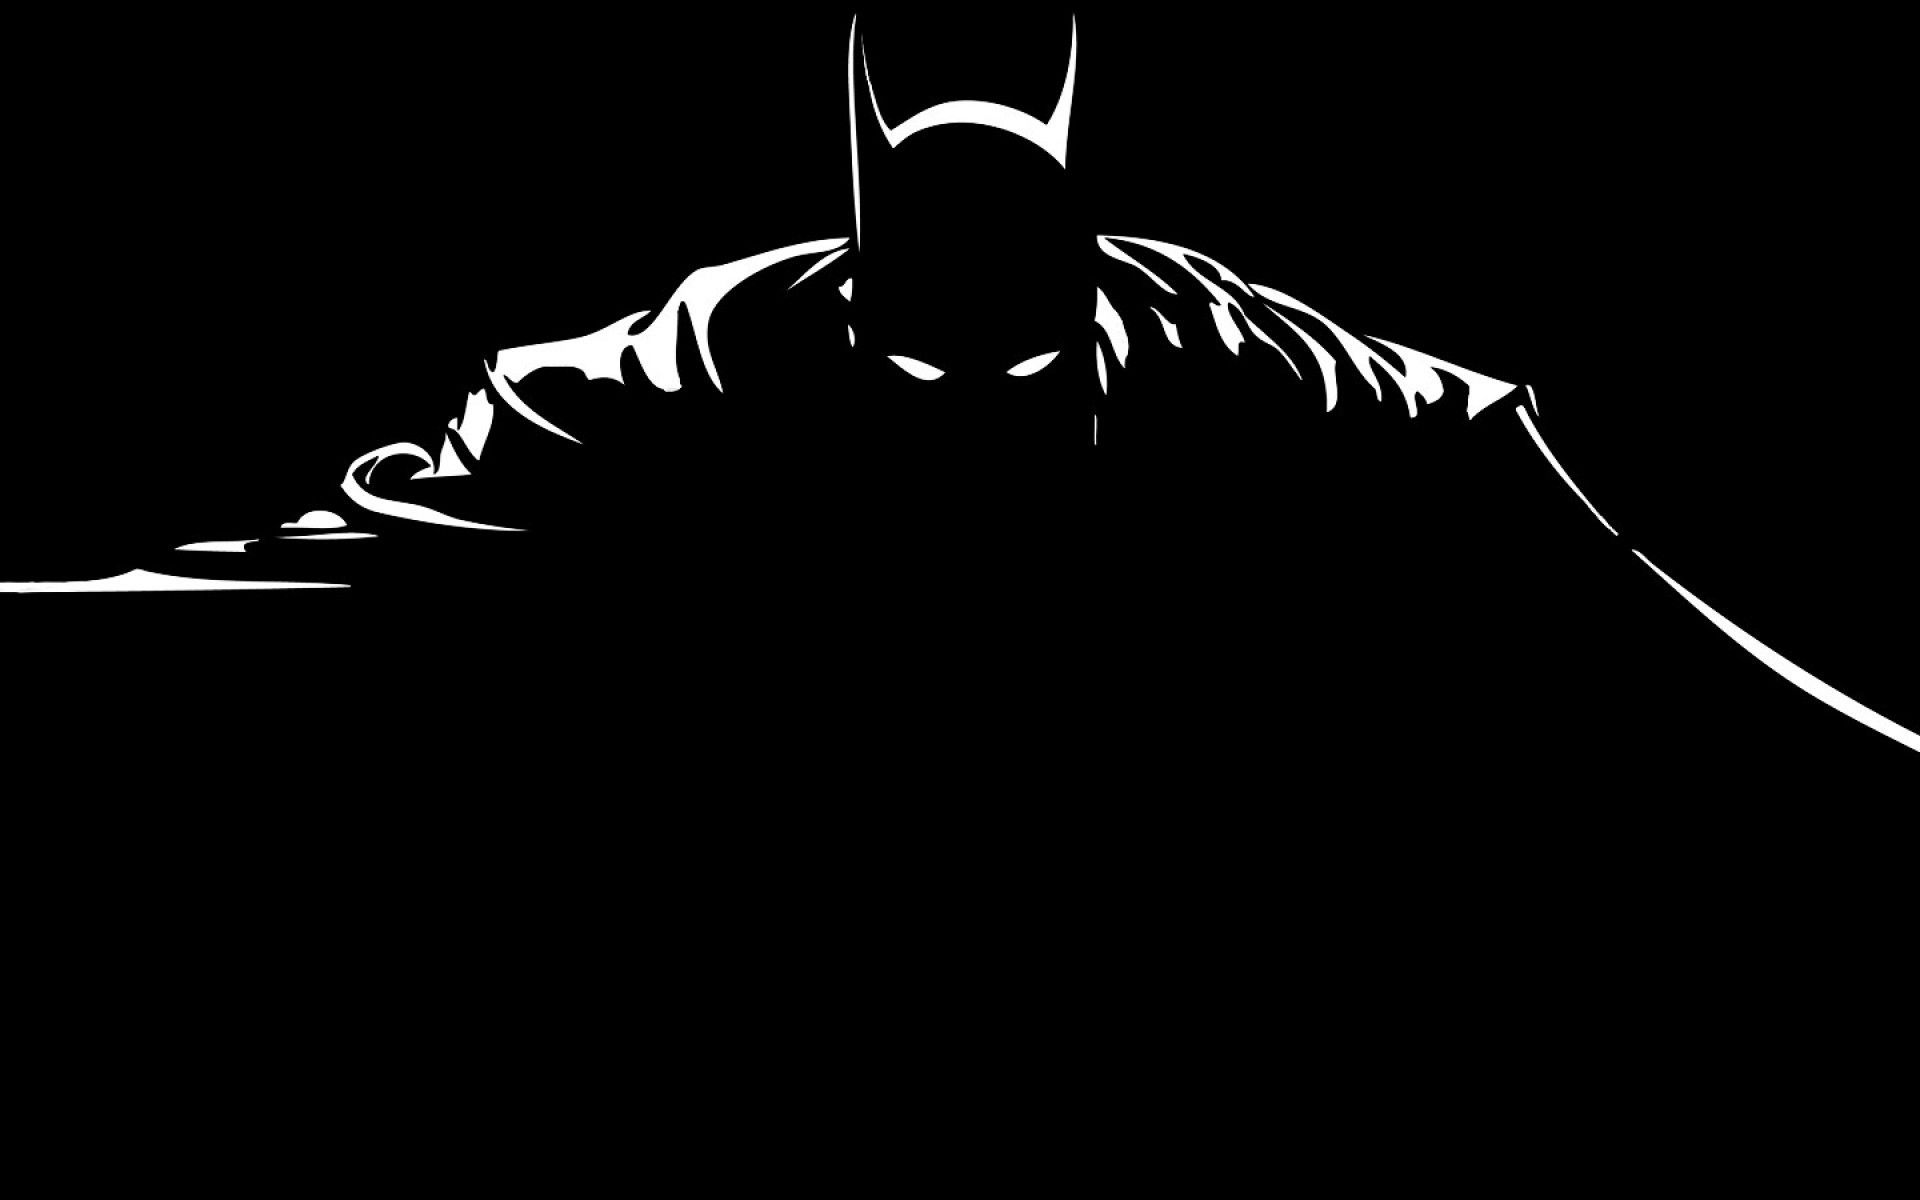 Batman Black And White Wallpapers Top Free Batman Black And